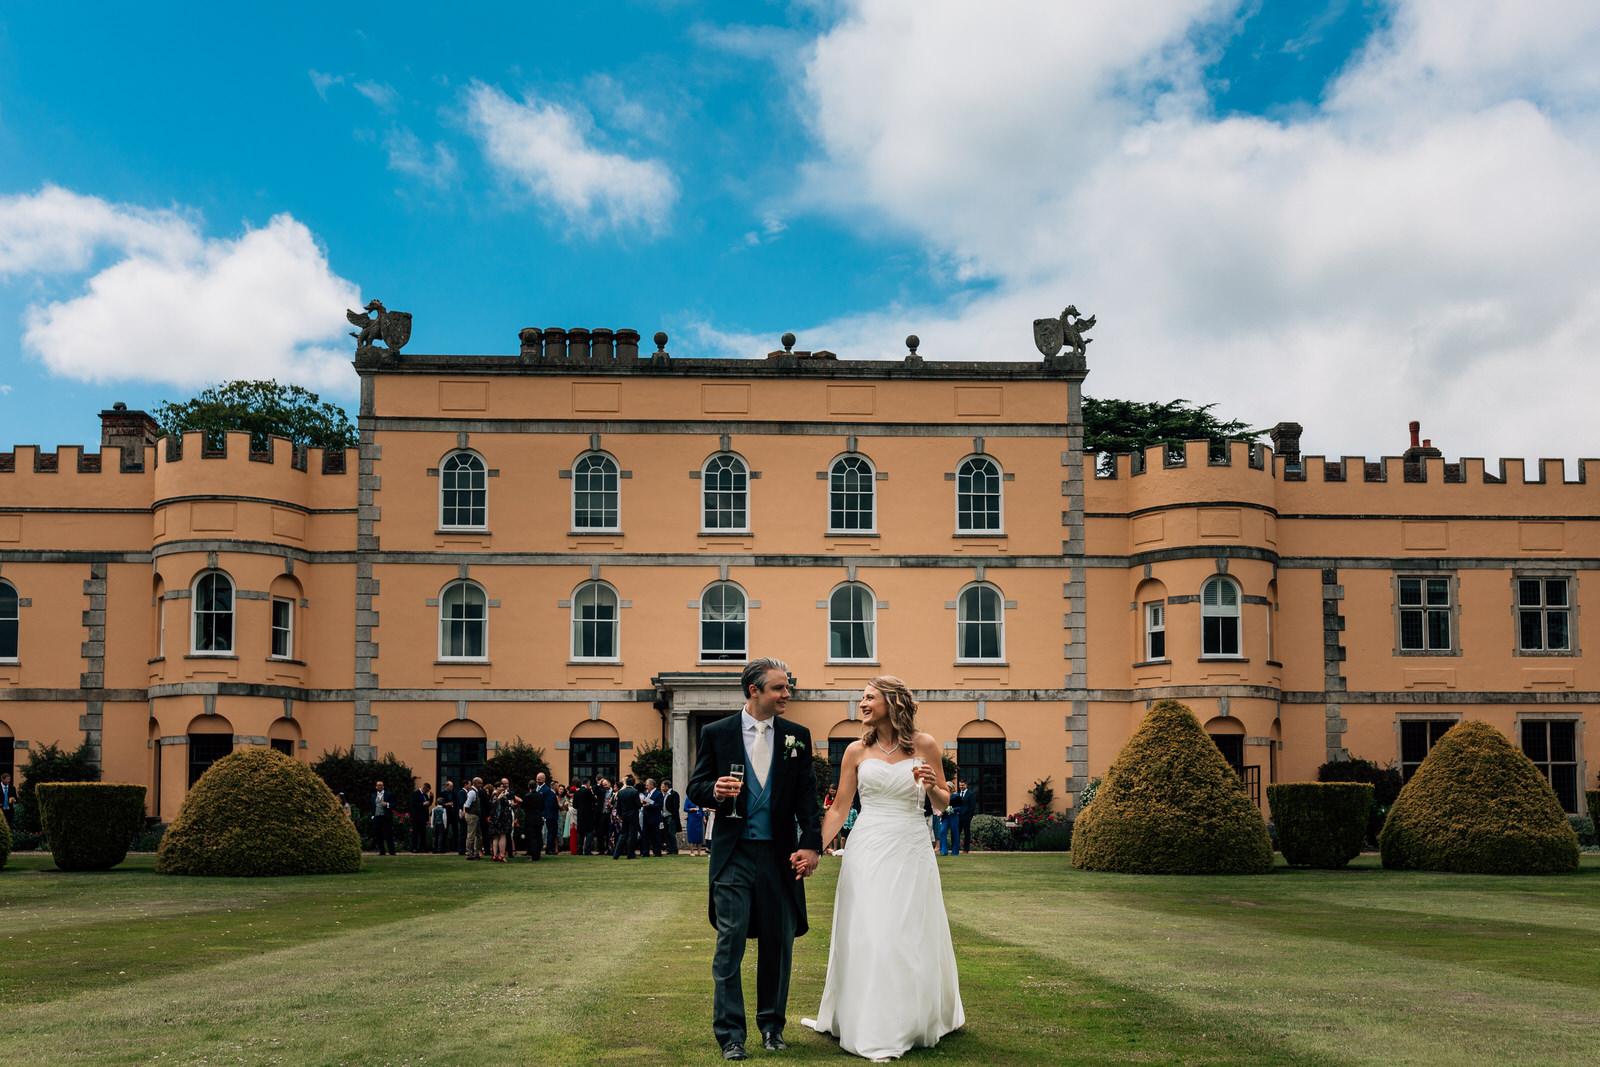 Home counties wedding photography by Damion Mower on English-Wedding.com (32)